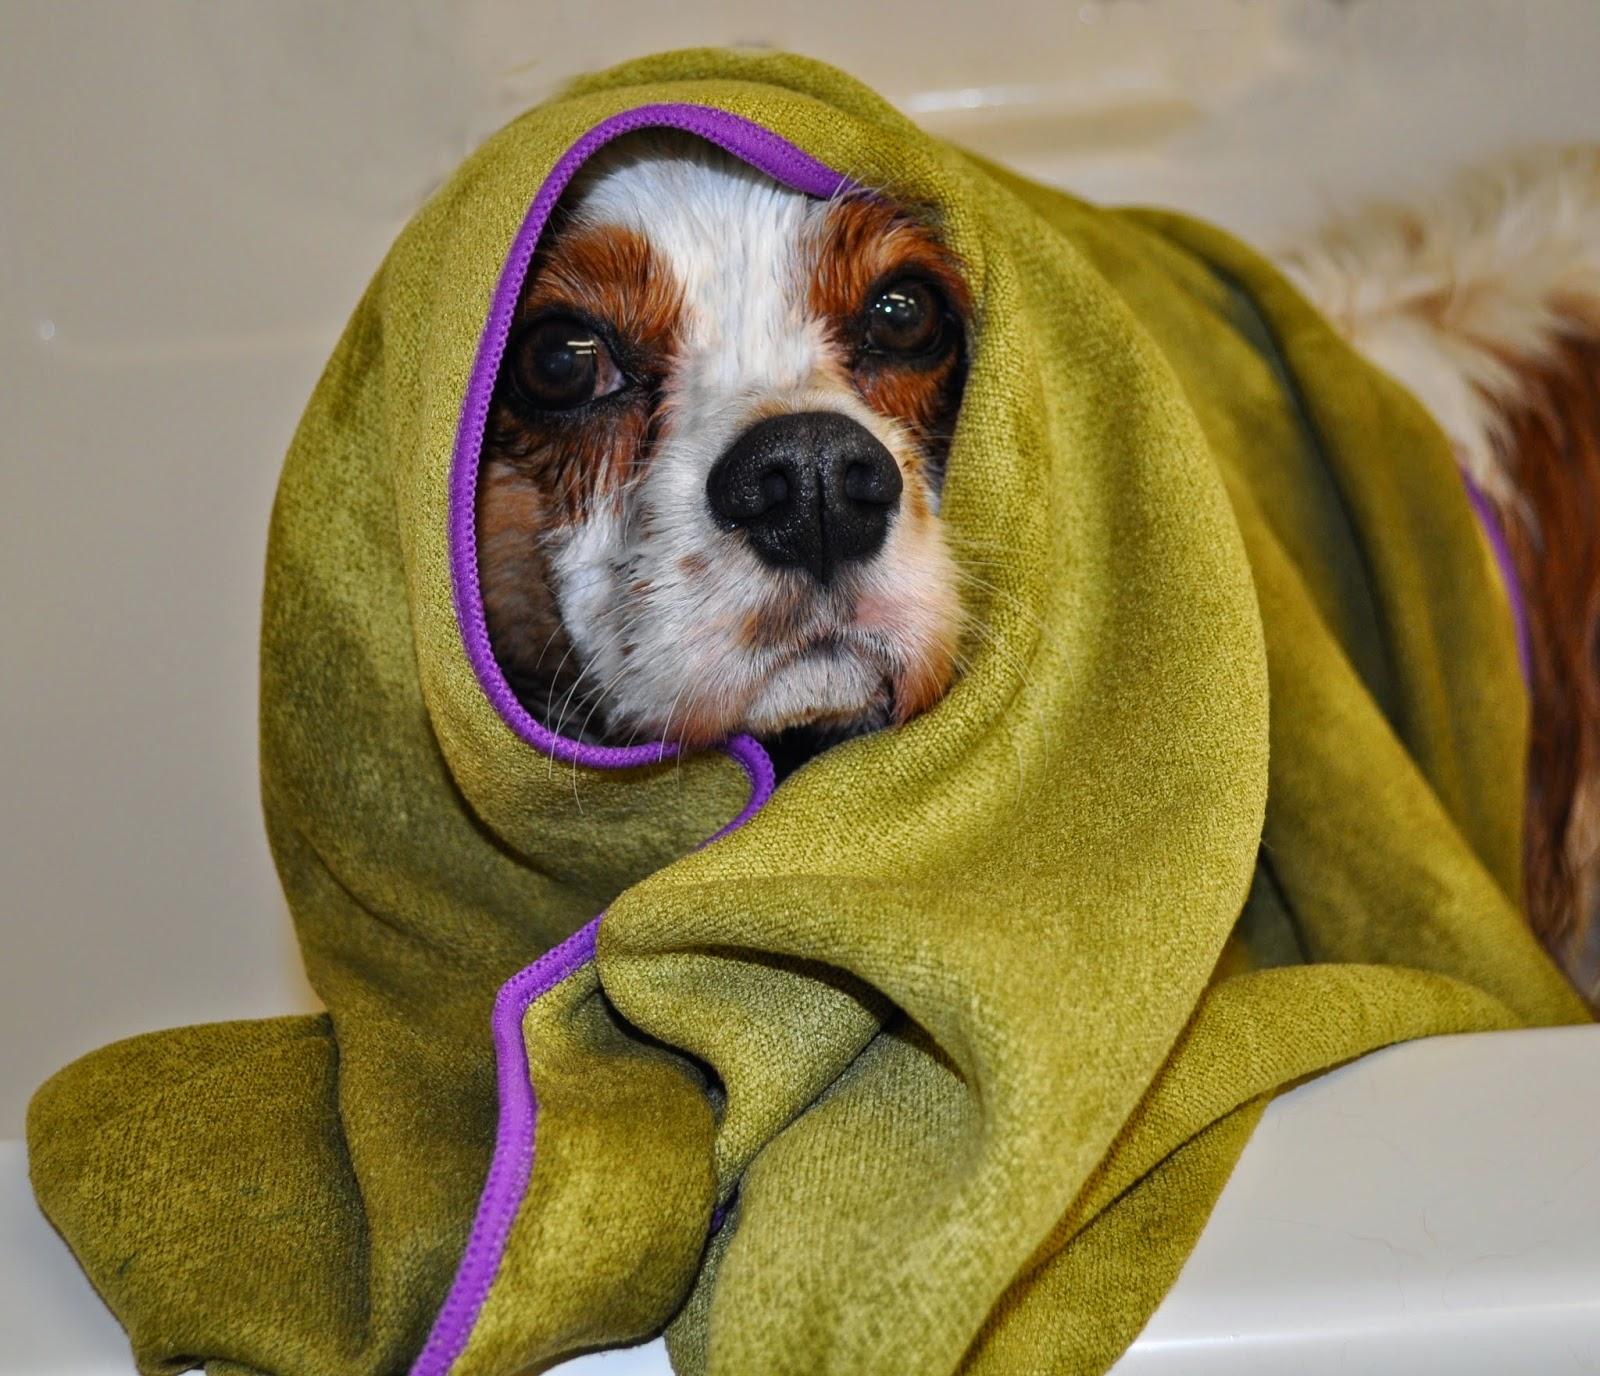 Mugzy's Mutt Dog Towel Review